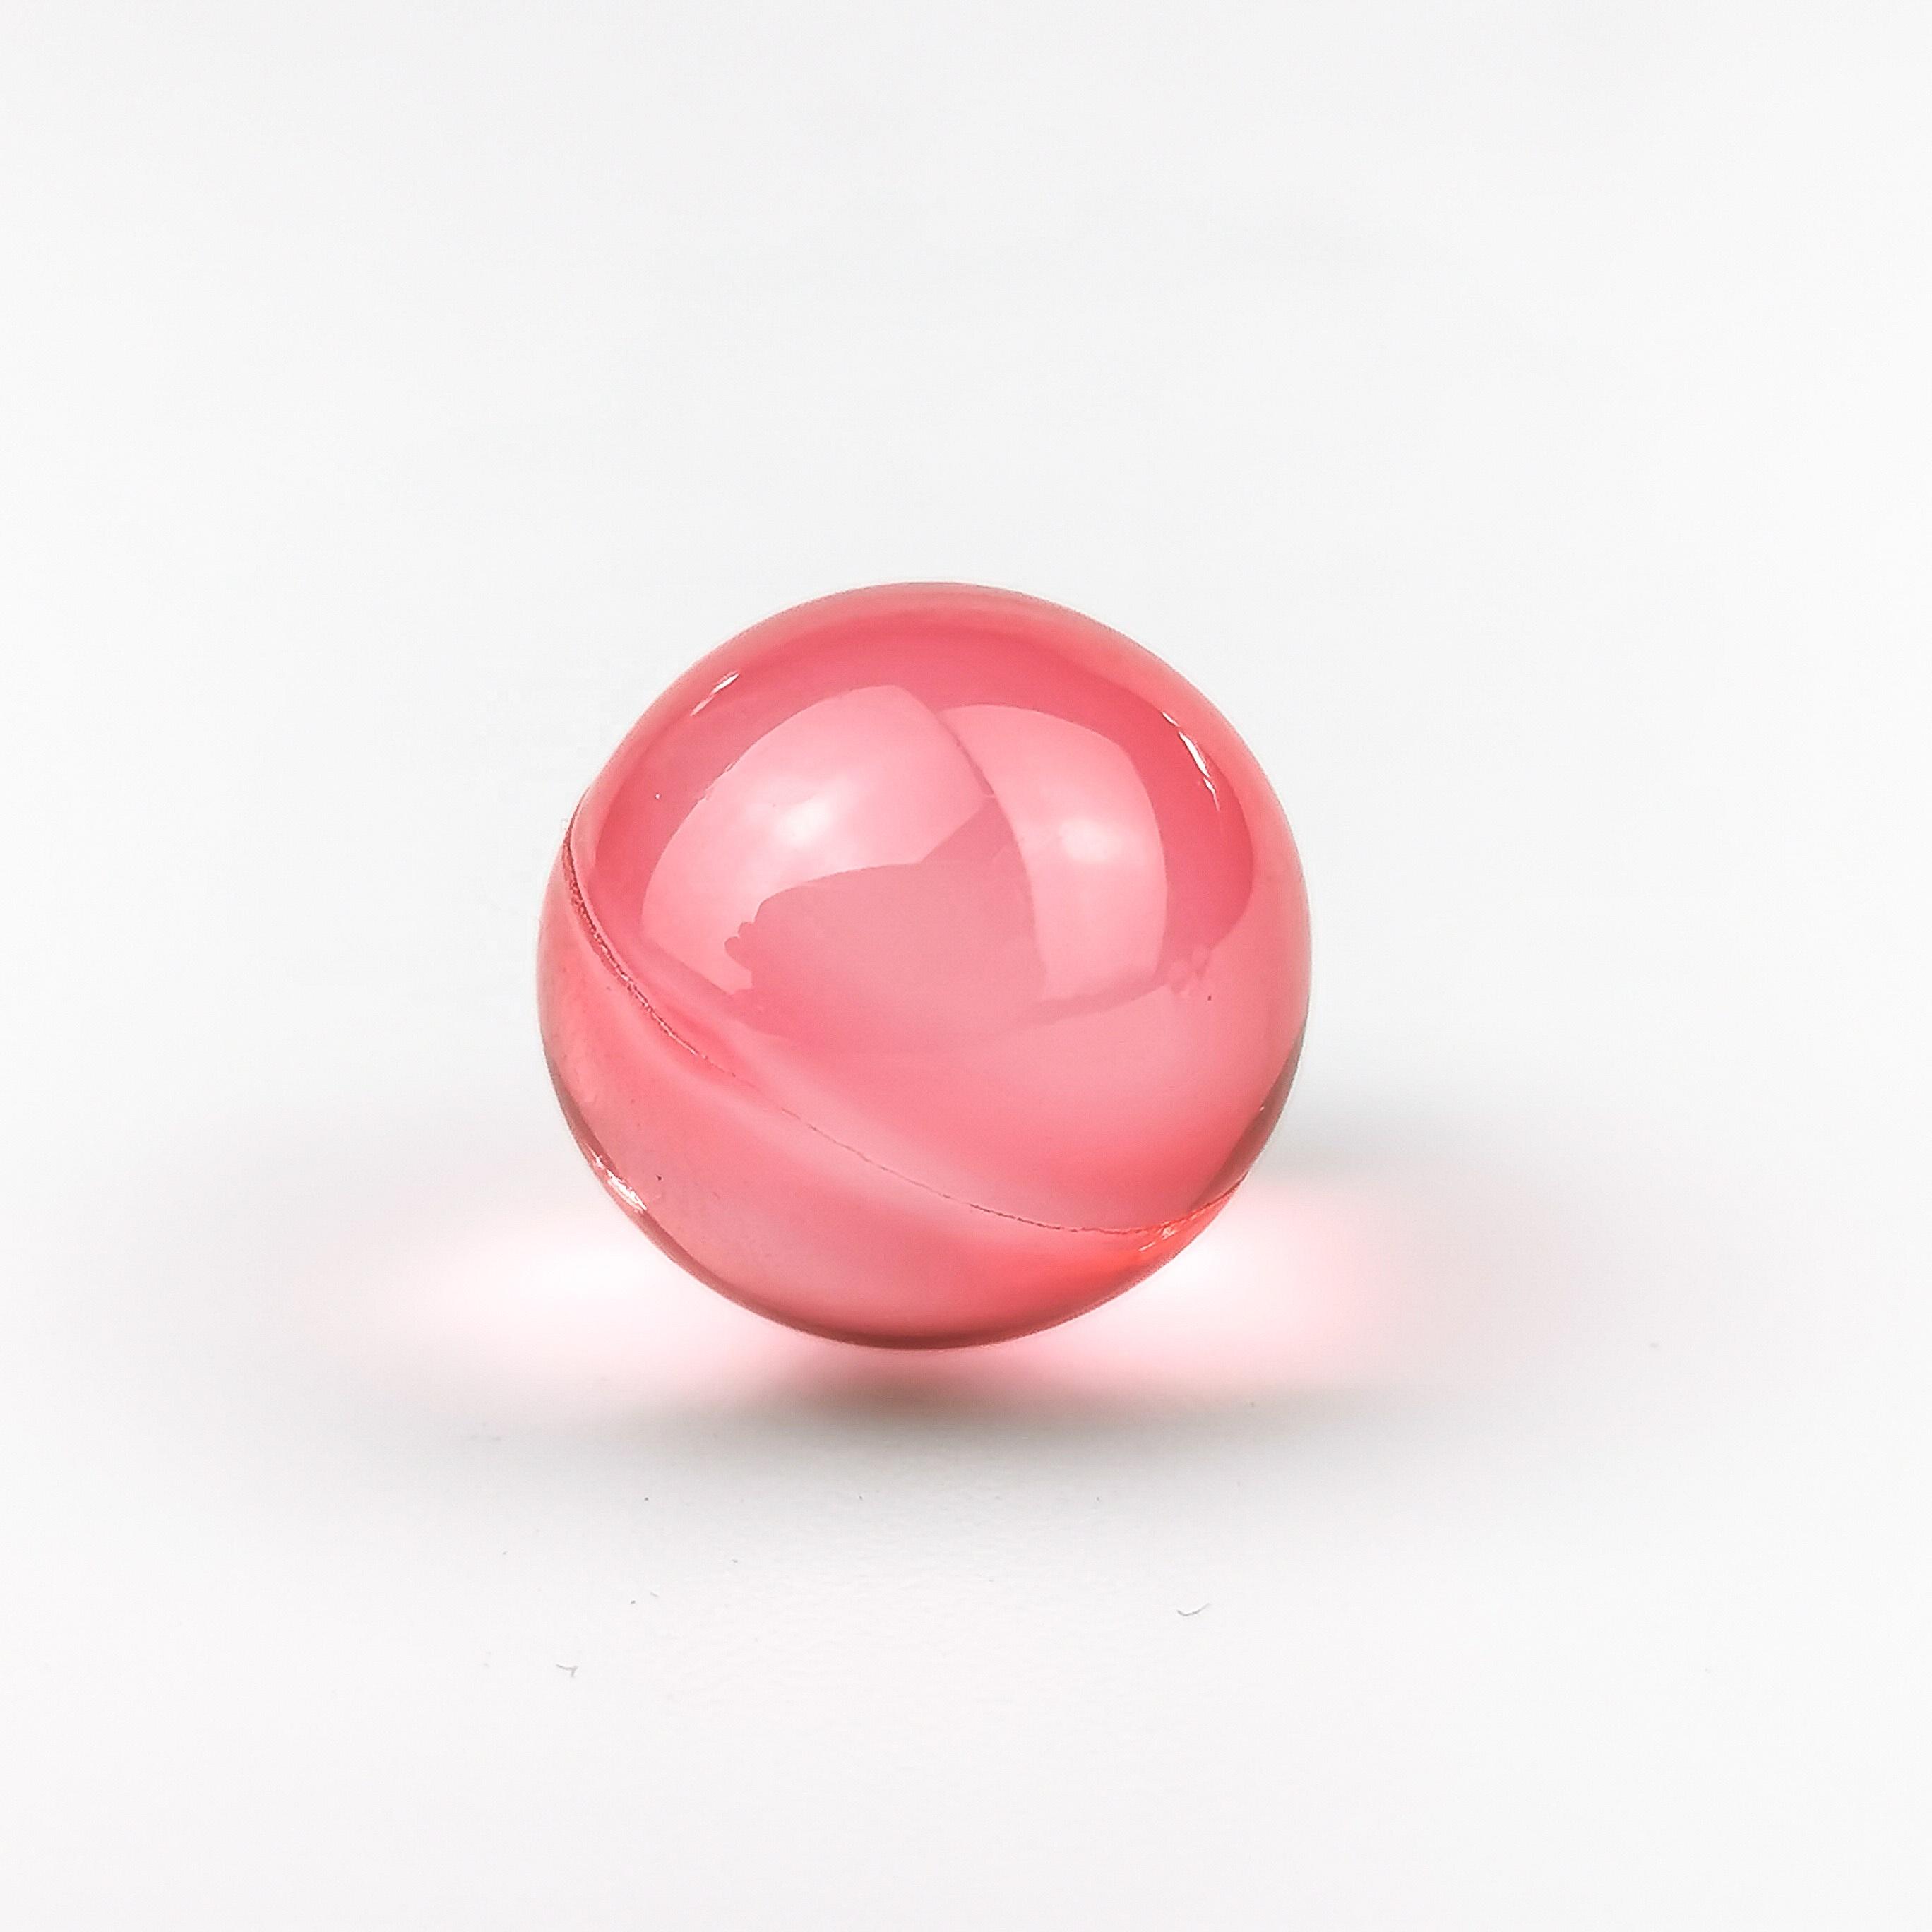 Bath Oil Beads Long lasting Peach Fragrance Soften And Moisturize Skin 4g Round